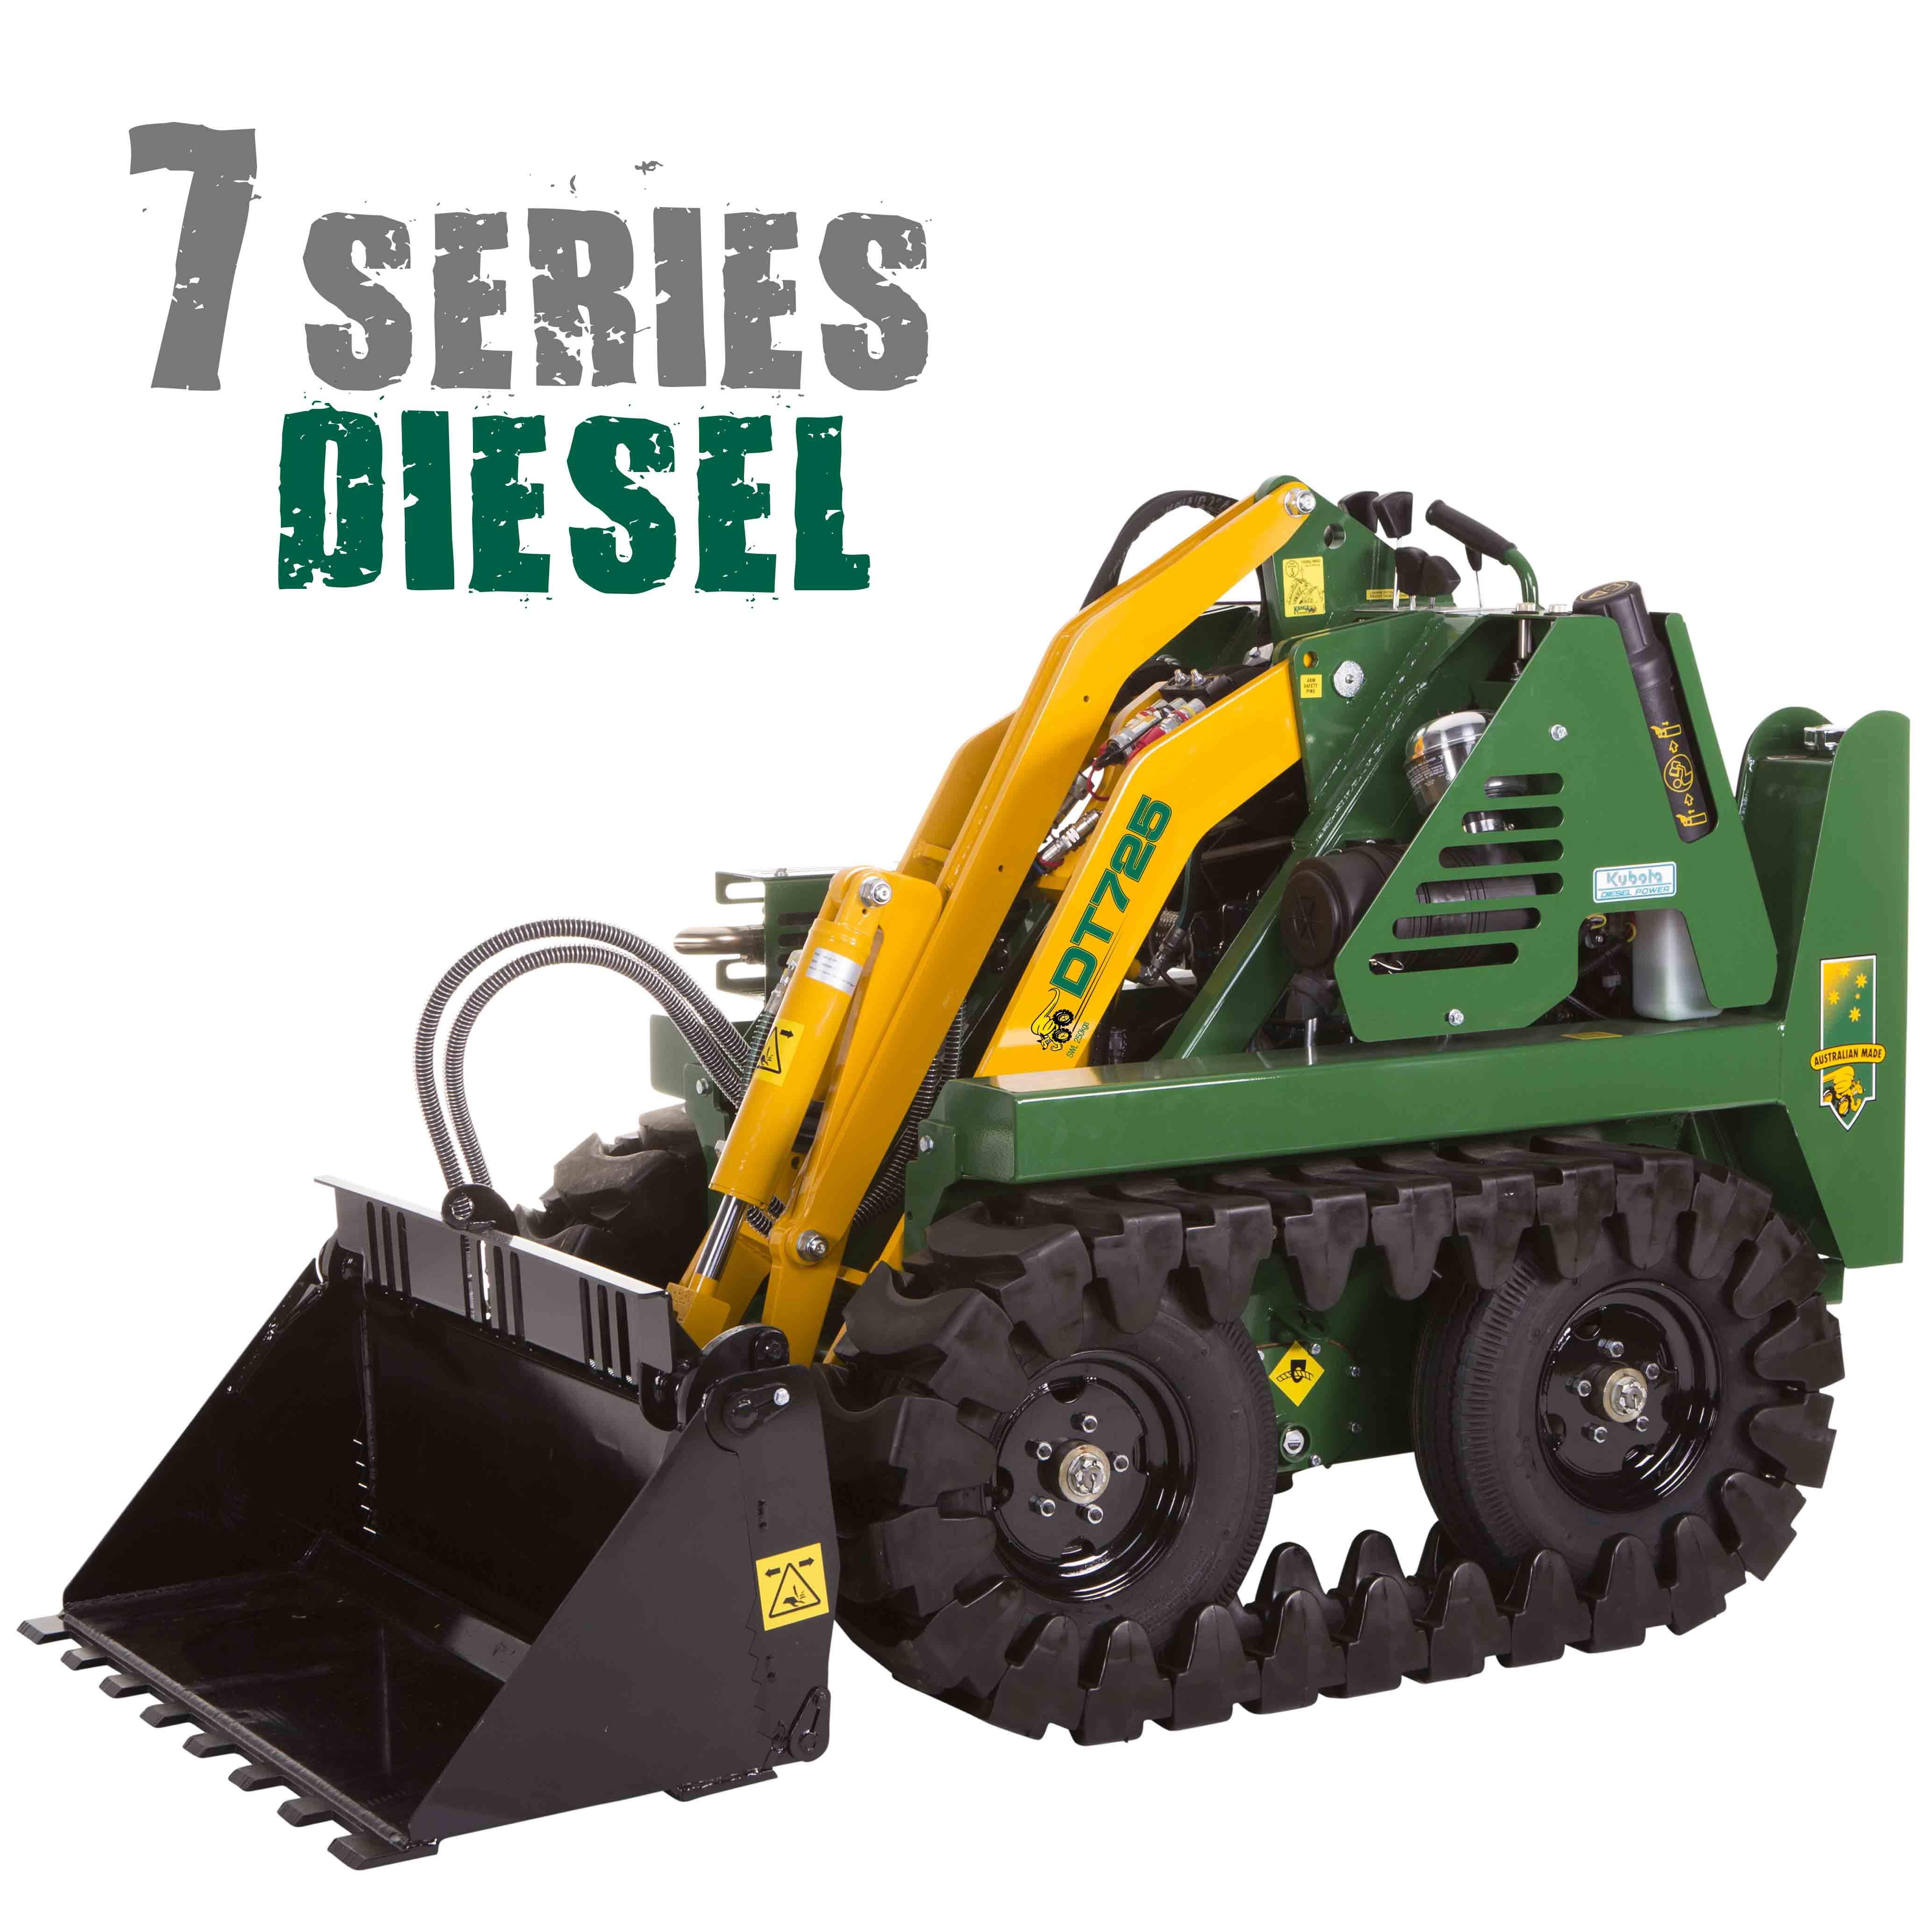 KANGA 7 SERIES Diesel Track Loader